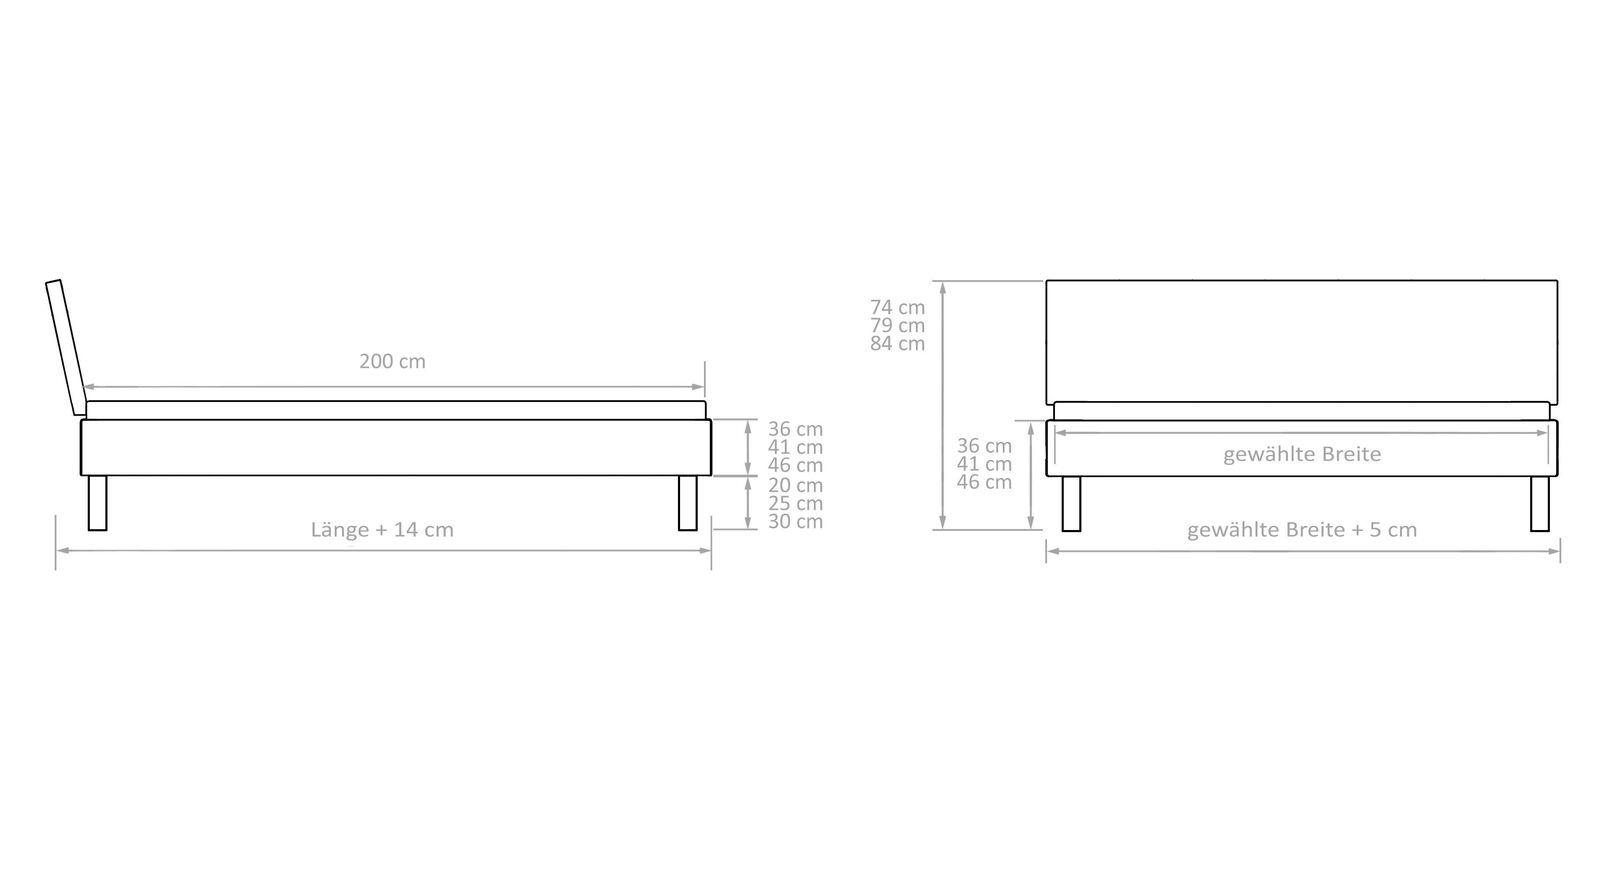 Maßgrafik zum Bett Tumas aus stabilem Massivholz